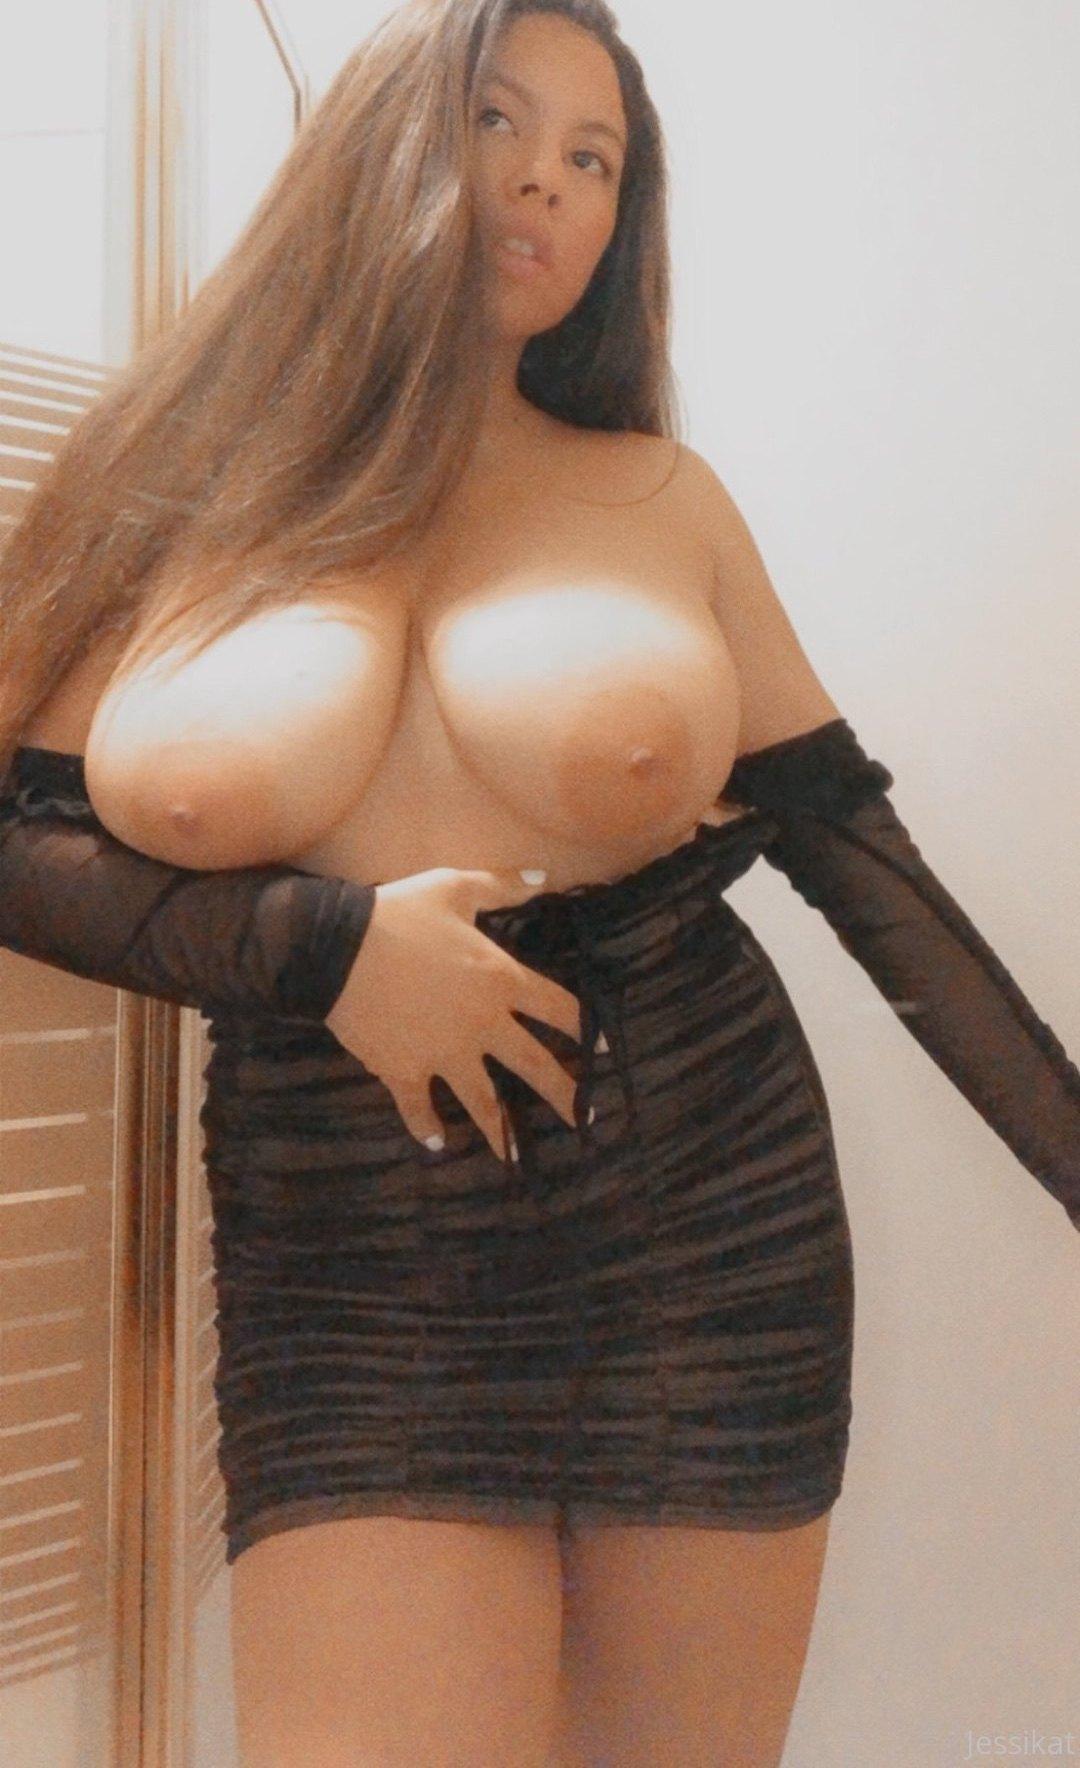 Jesselle Jessikat Onlyfans Nudes Leaks 0003